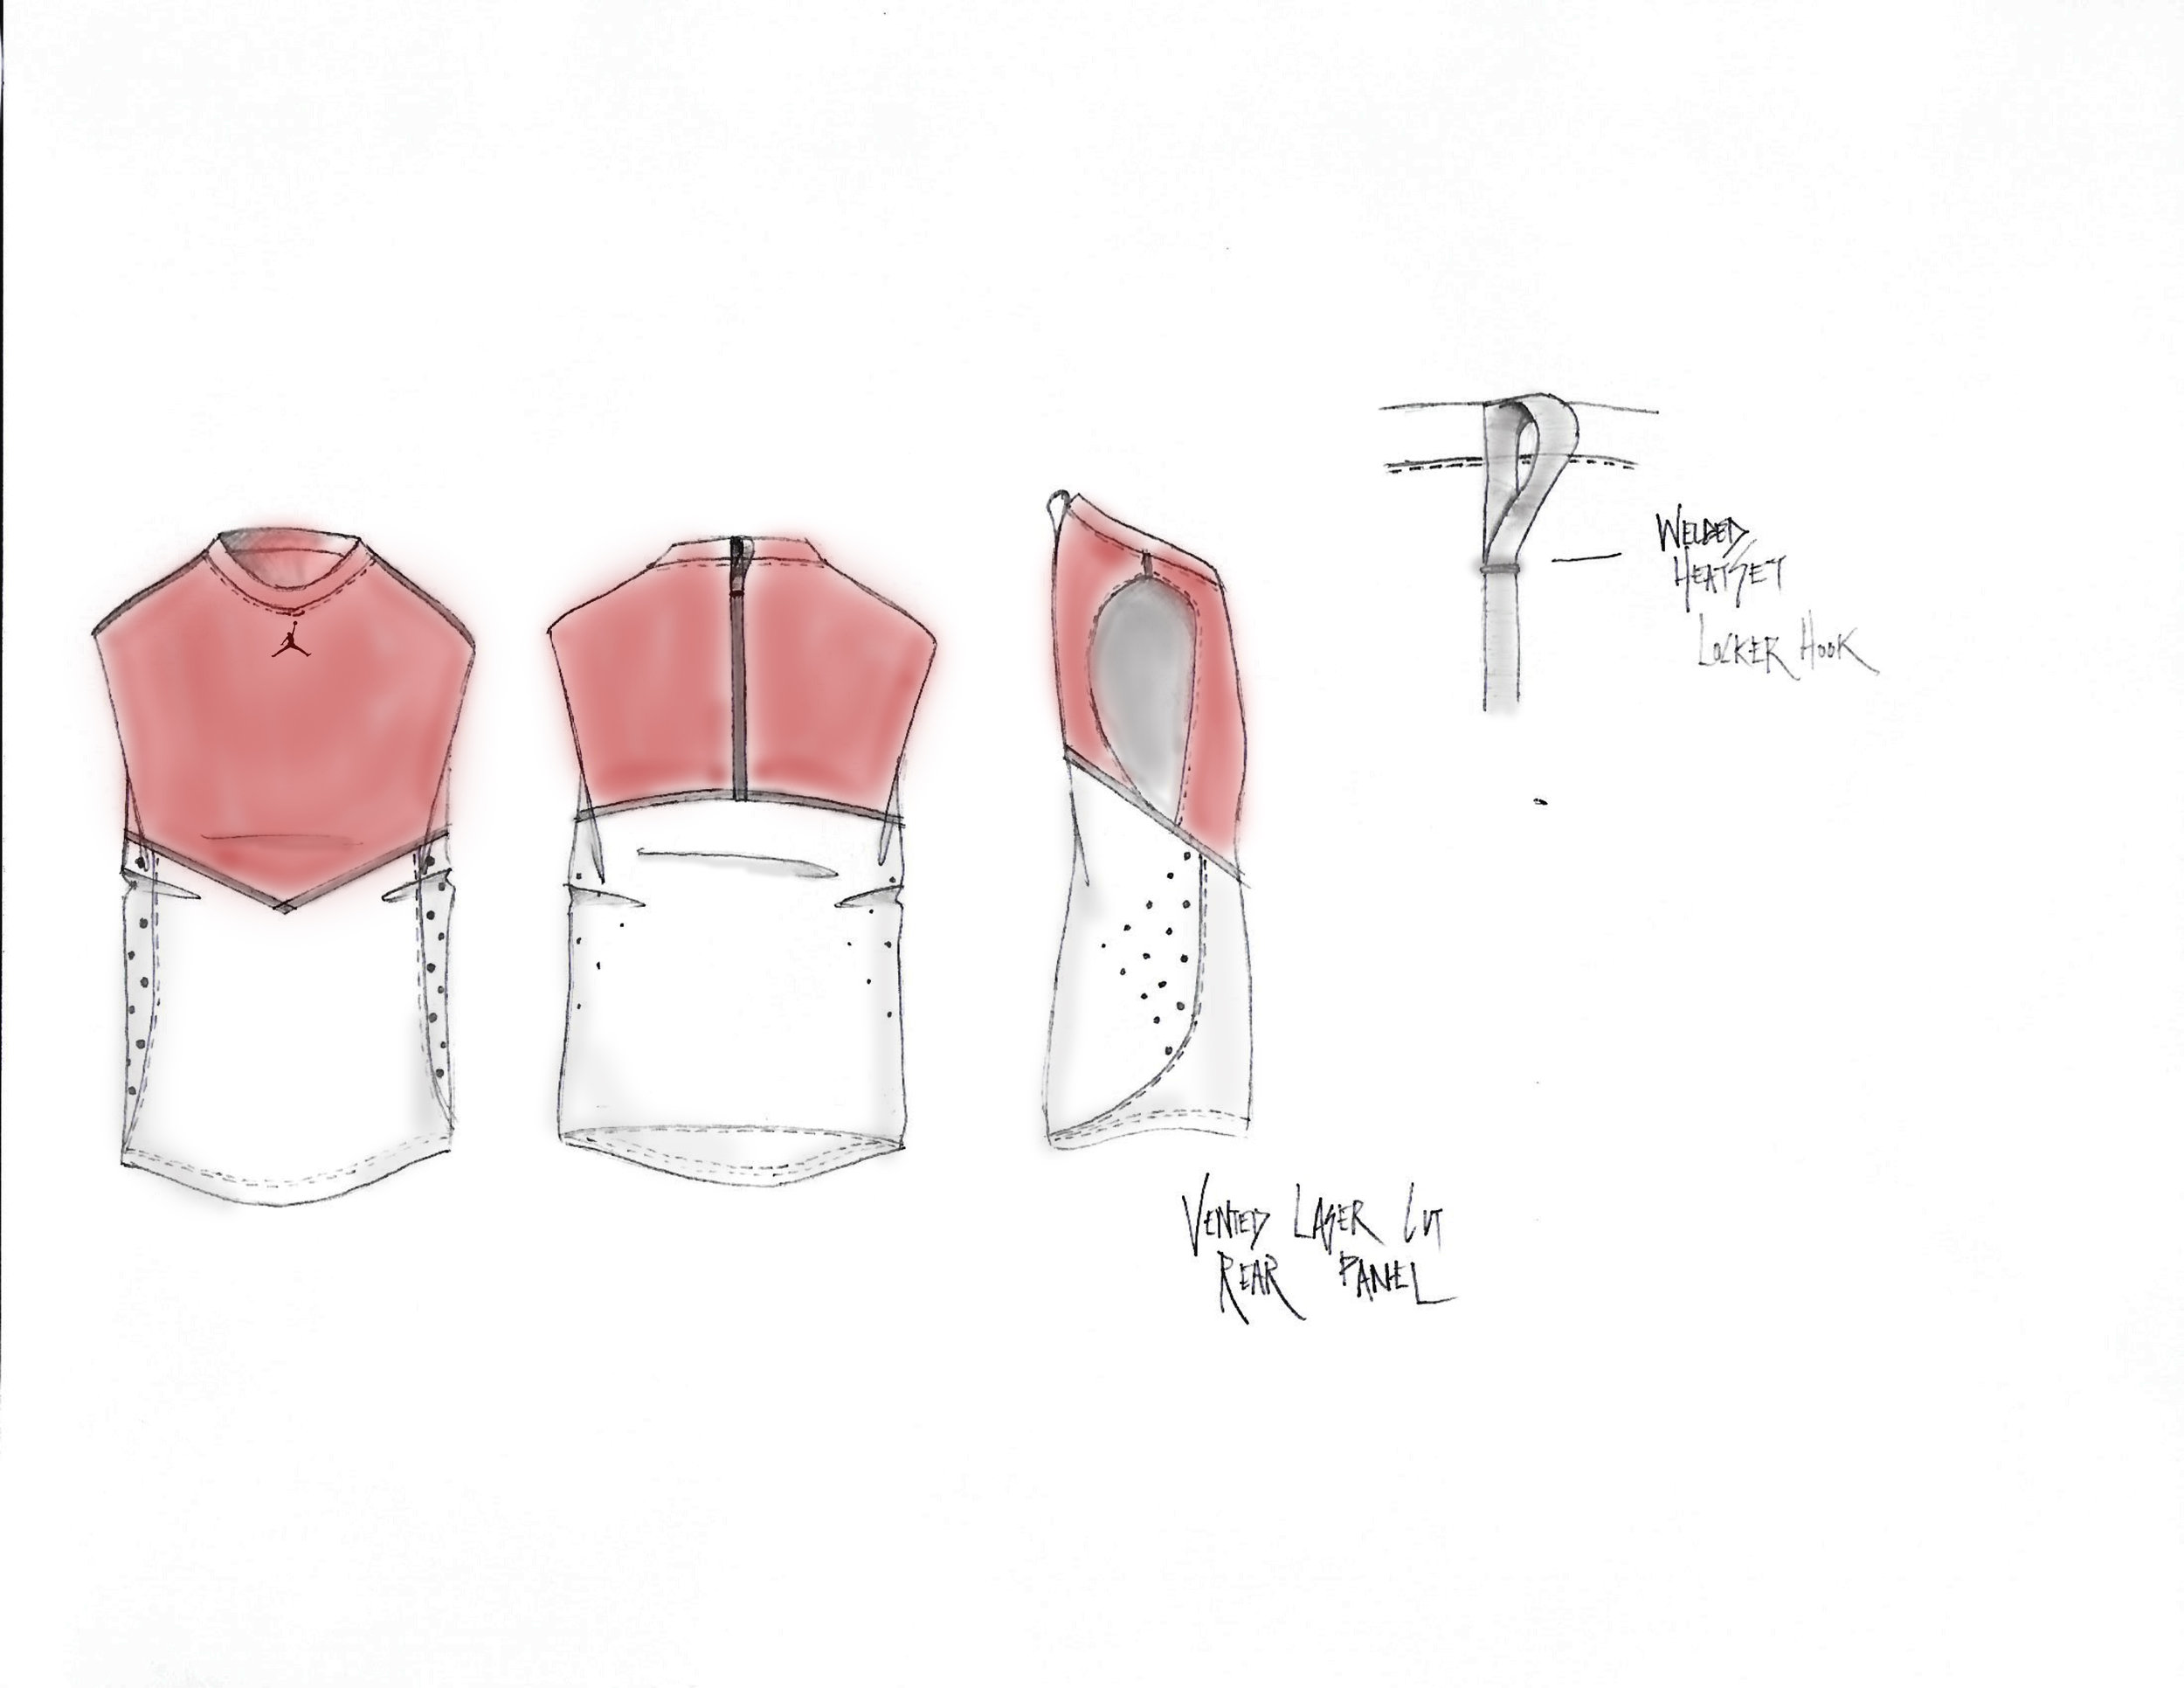 jordan-sketches-1-3.jpg